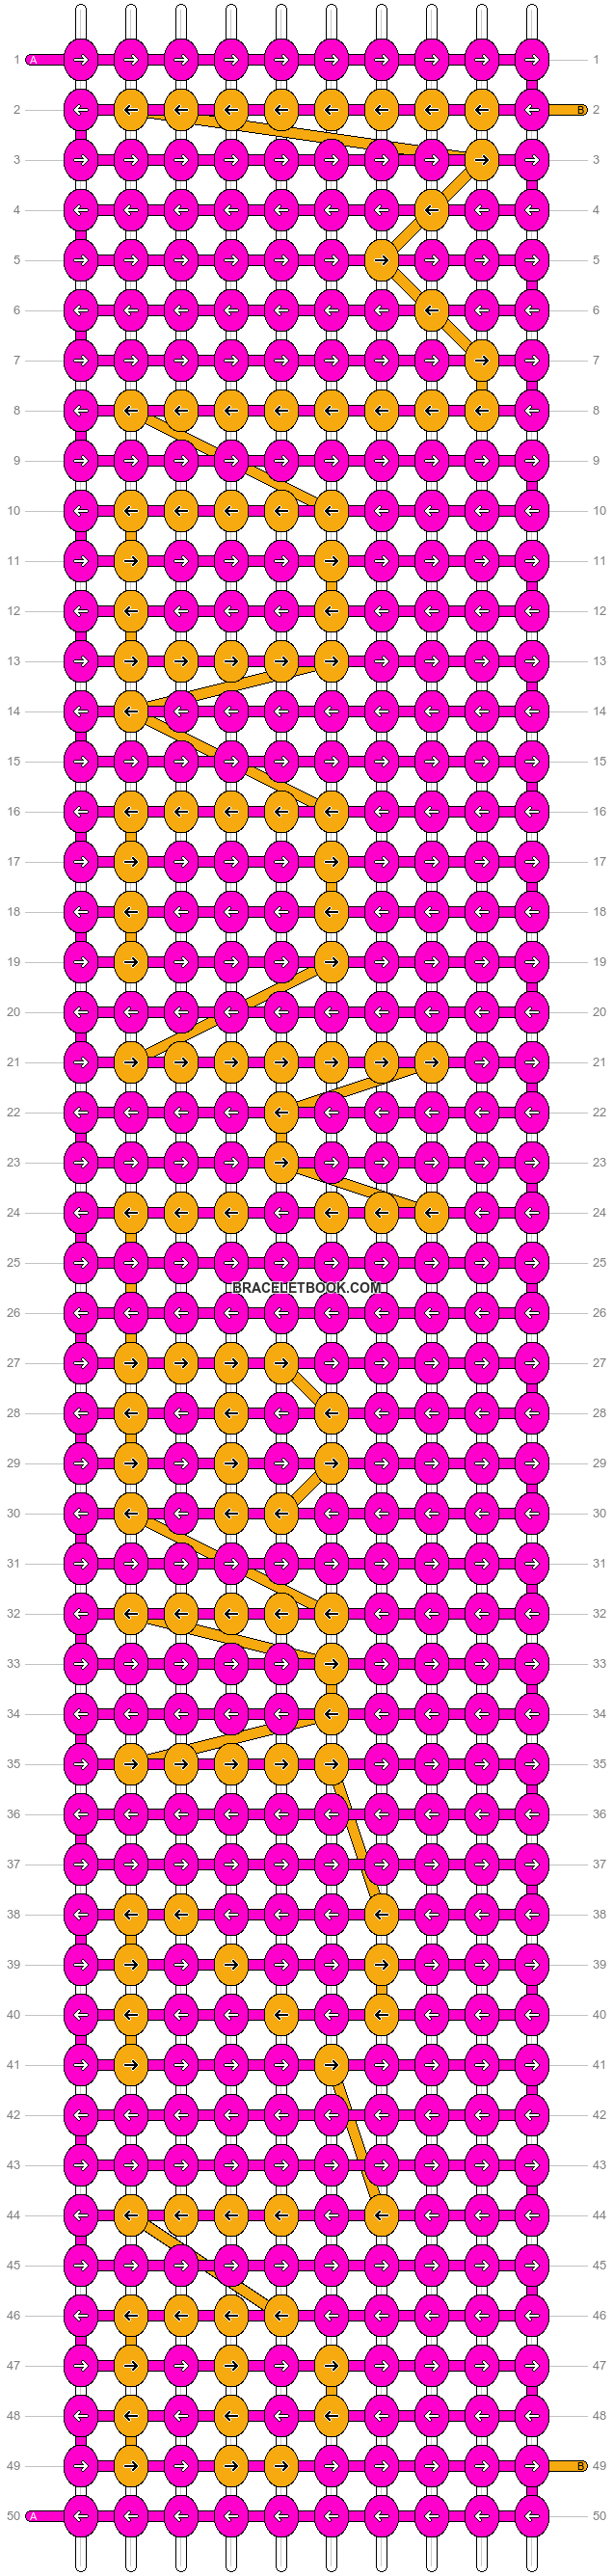 Alpha pattern #4840 pattern